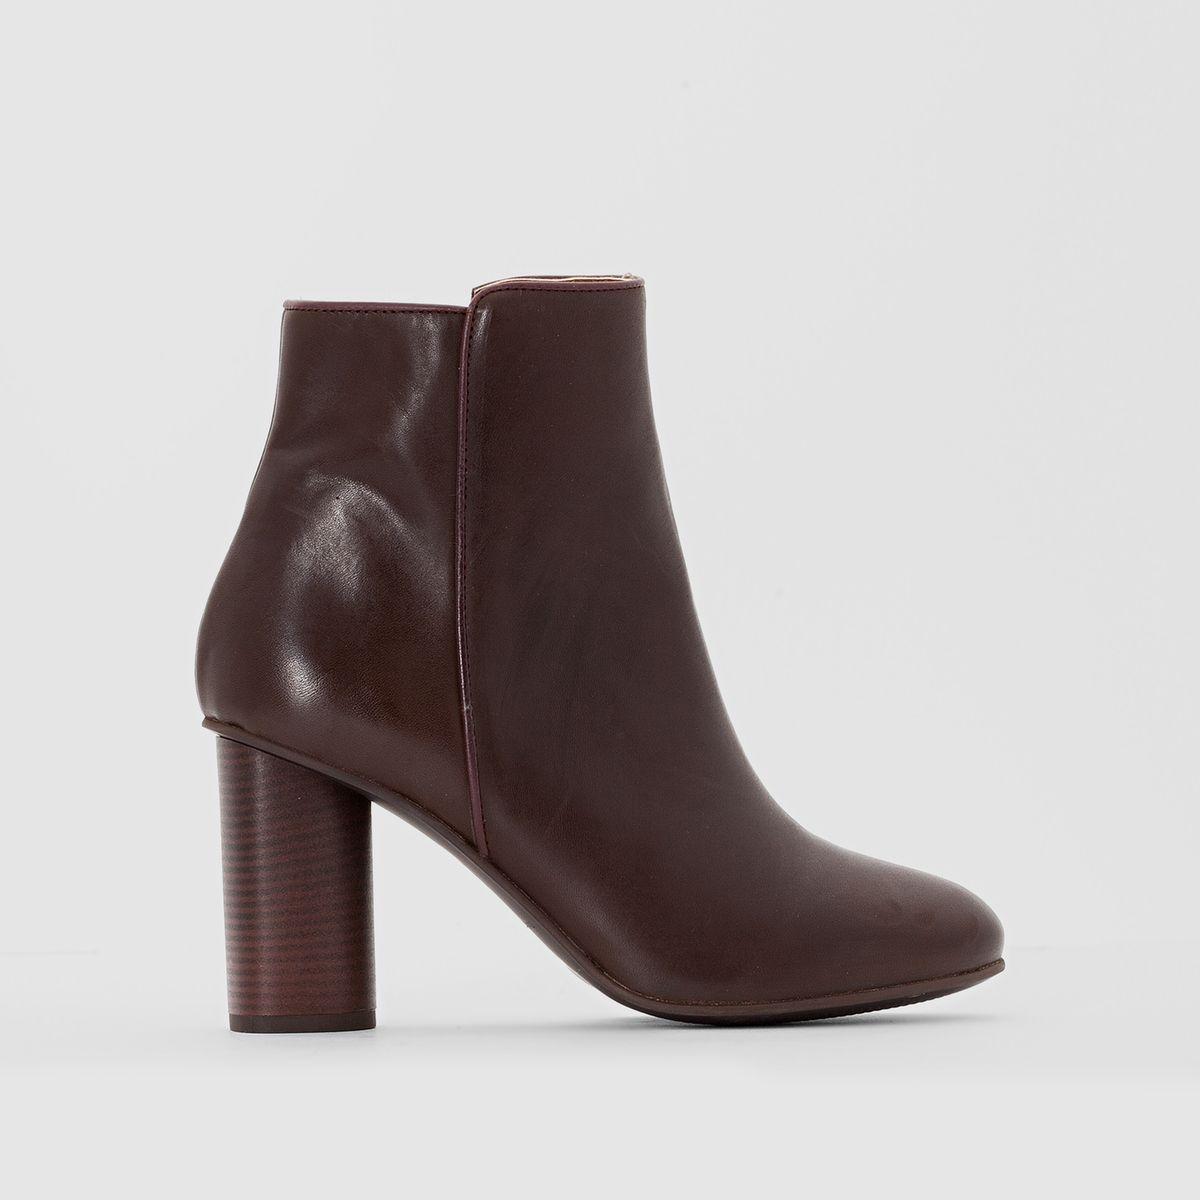 Boots cuir talon haut